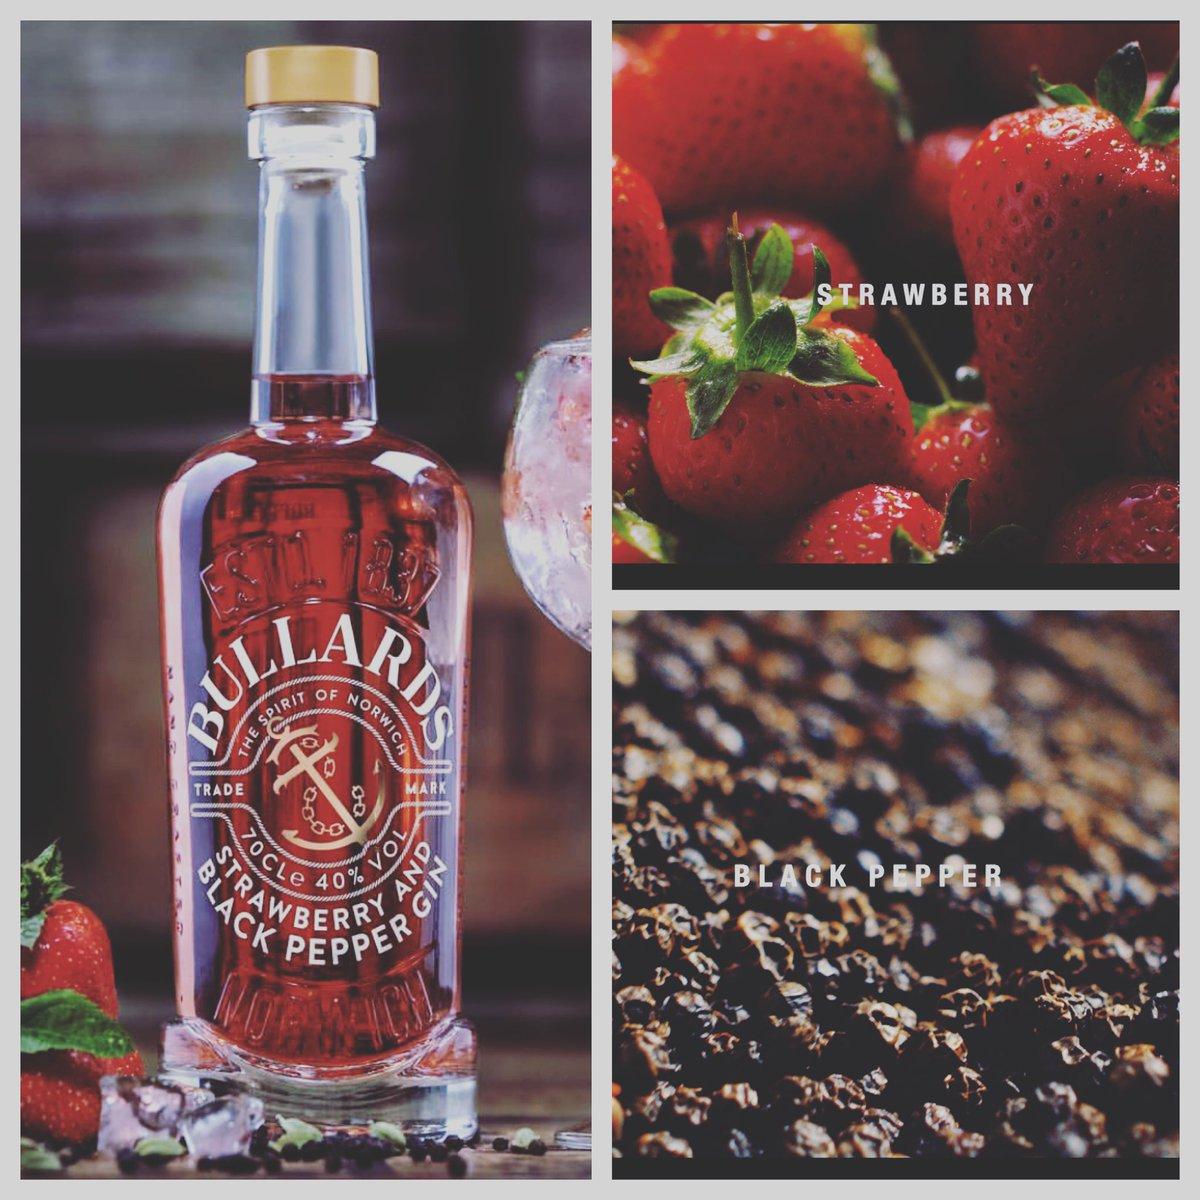 bullards strawberry and black pepper gin